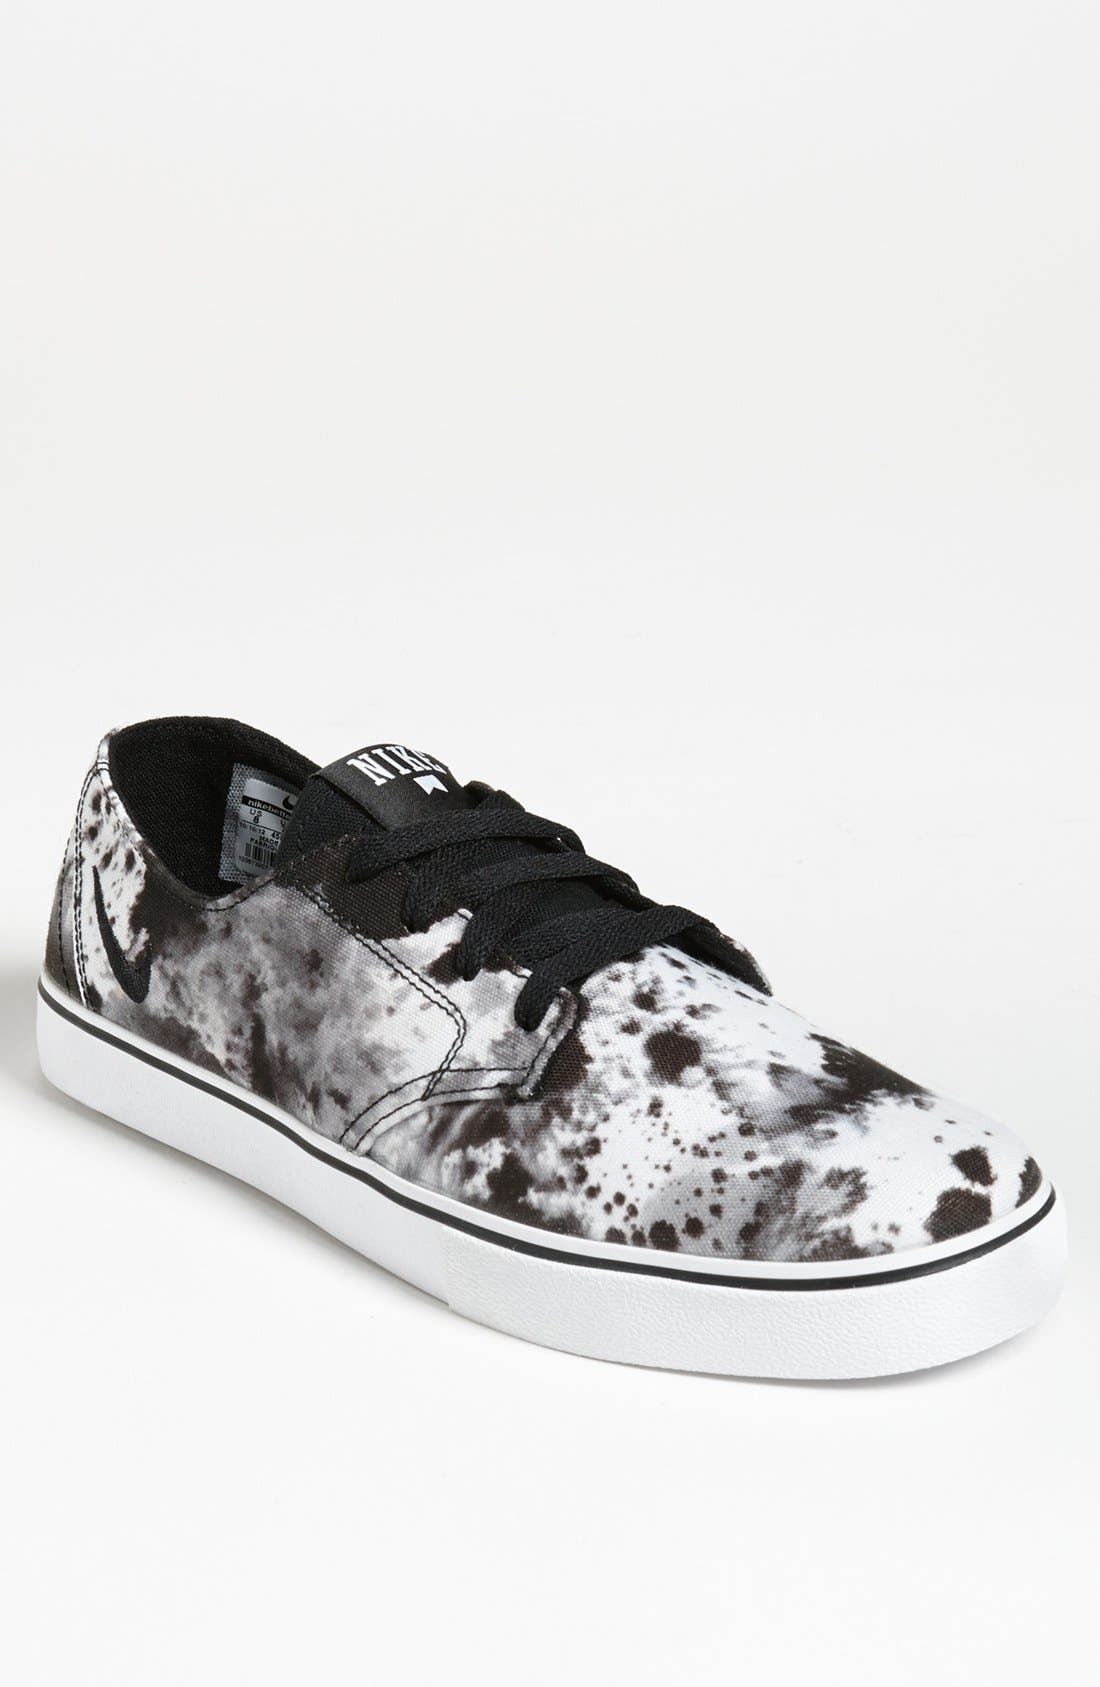 Alternate Image 1 Selected - Nike 'Braata Leather Premium' Sneaker